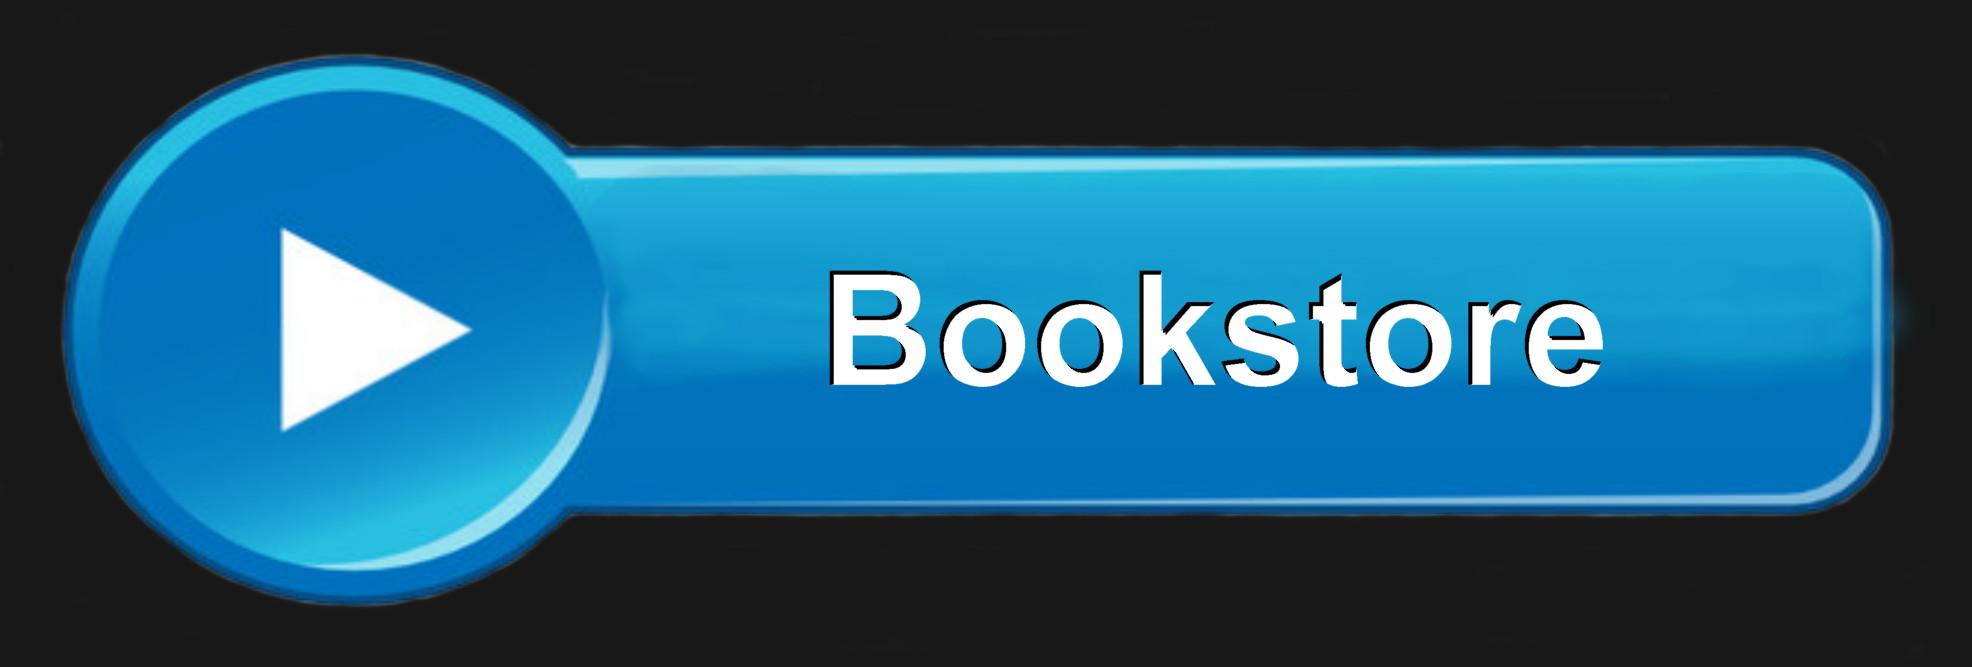 Enter tag bookstore